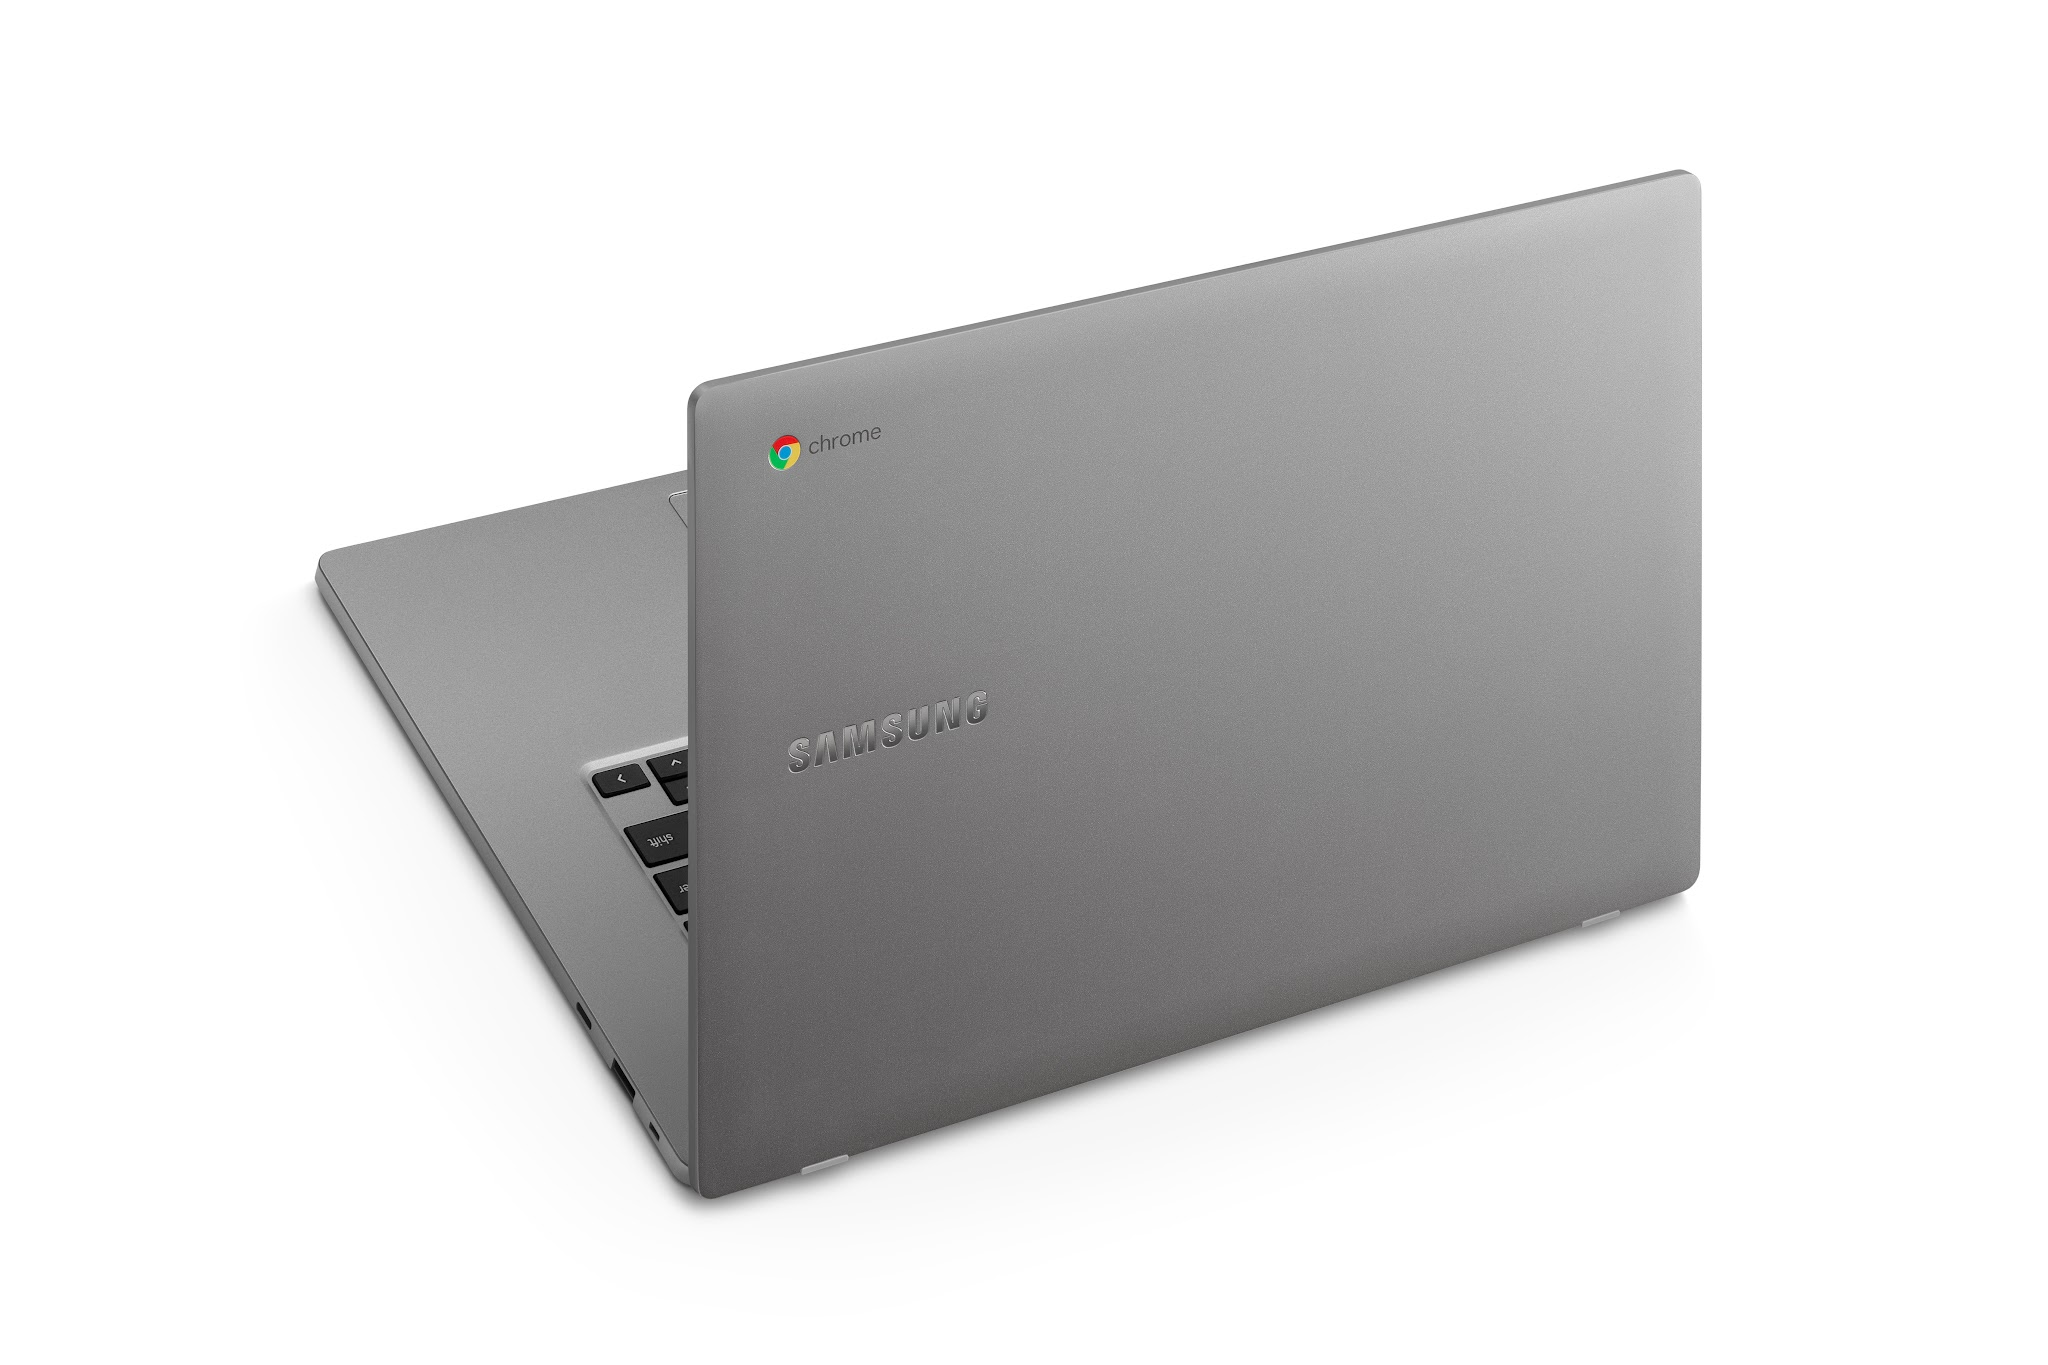 Samsung Chromebook 4+ - photo 9